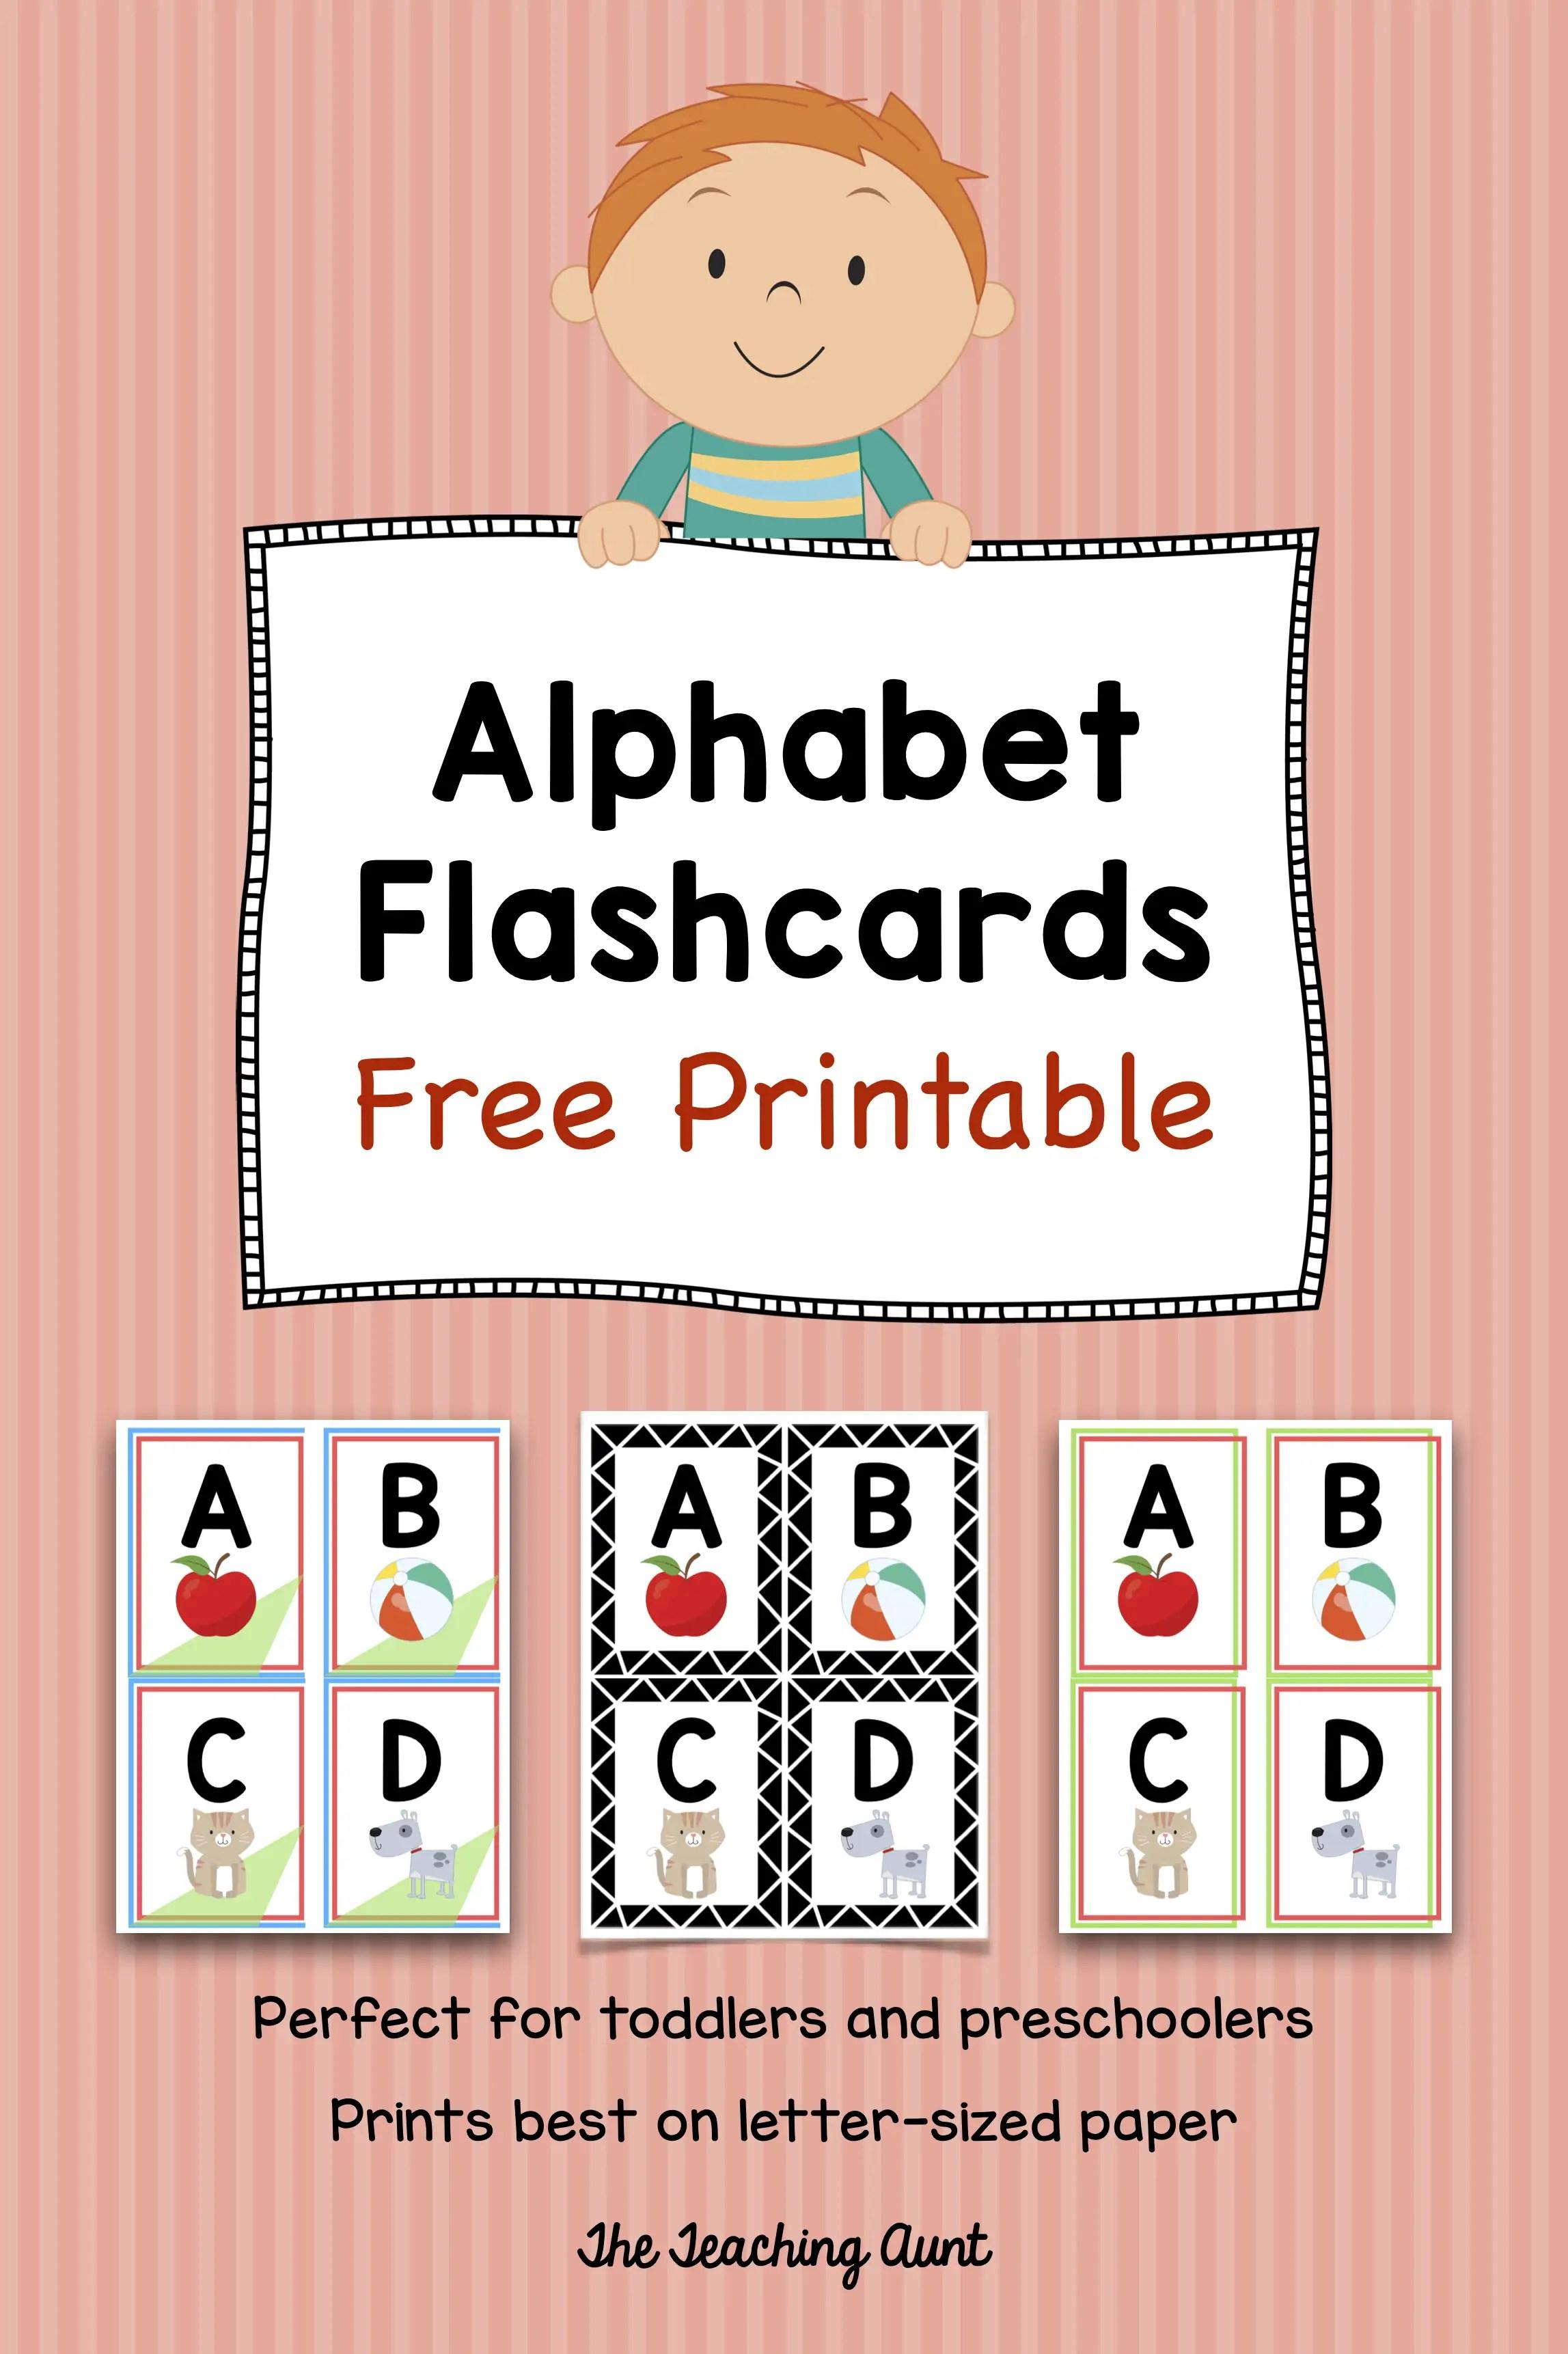 image regarding Free Printable Alphabet Flash Cards titled Alphabet Flashcards Cost-free Printable - The Training Aunt